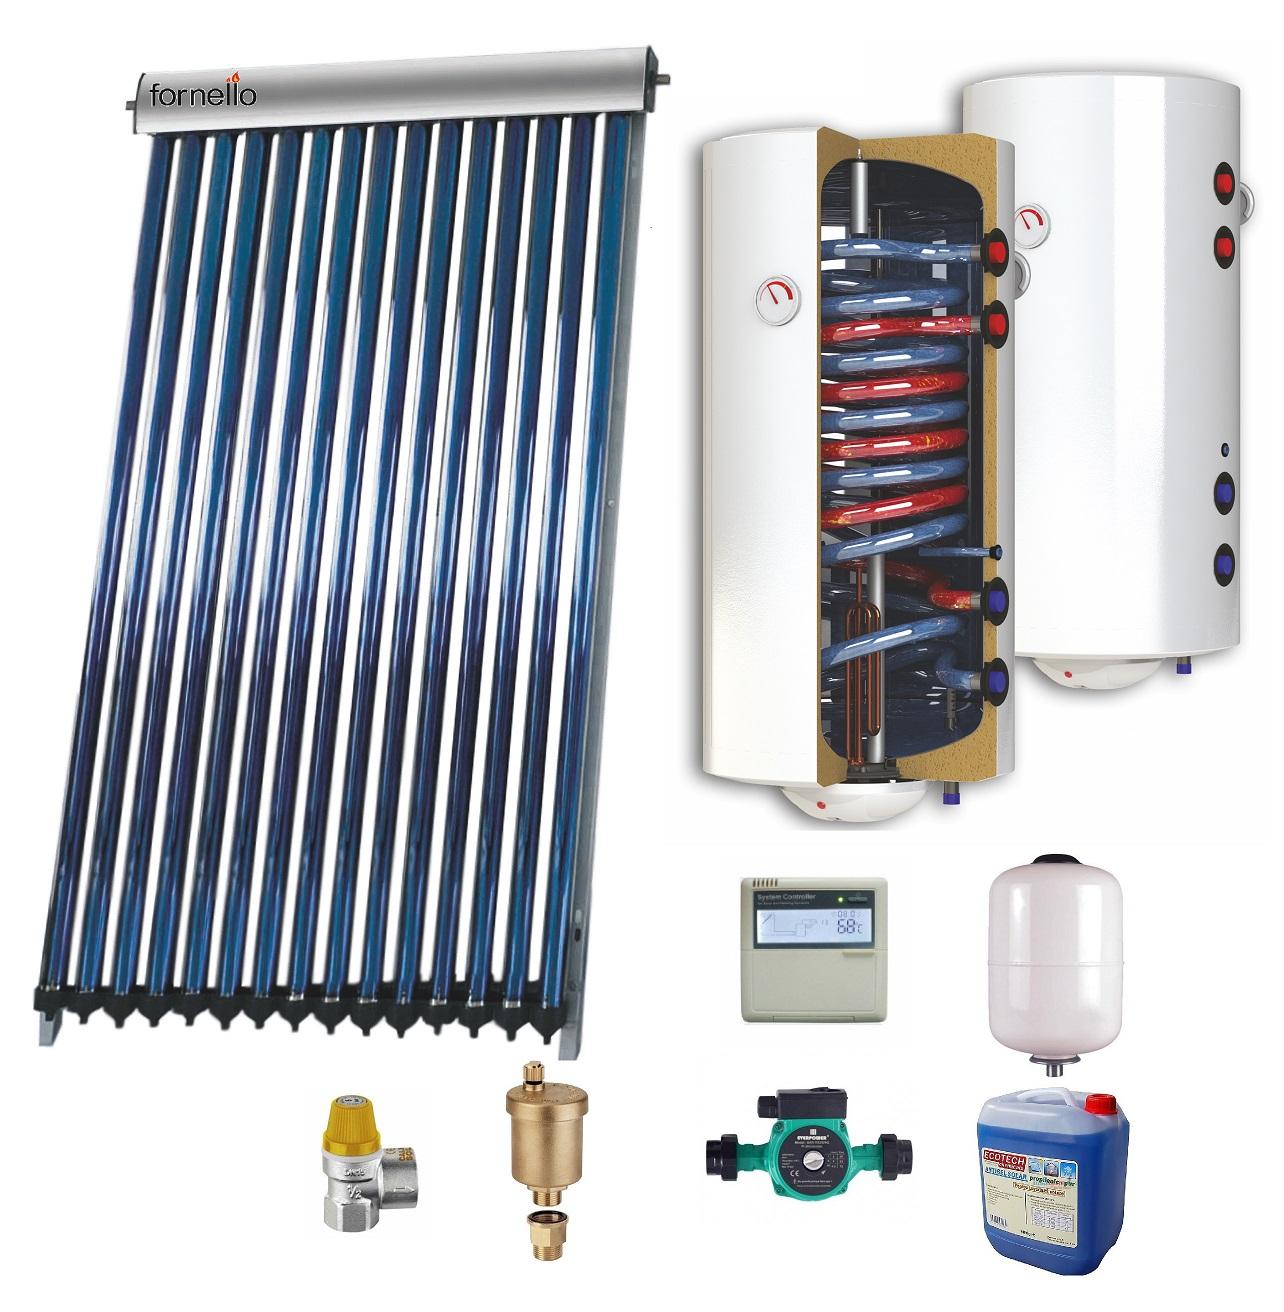 Sistem solar presurizat , panou Sunsystem VTC 15, boiler cu 2 serpentine si rezistenta electrica Sunsystem 100 litri, pompa 25-60, controller, vas expansiune, antigel, supapa 1/2, aerisitor 1/2 fornello imagine